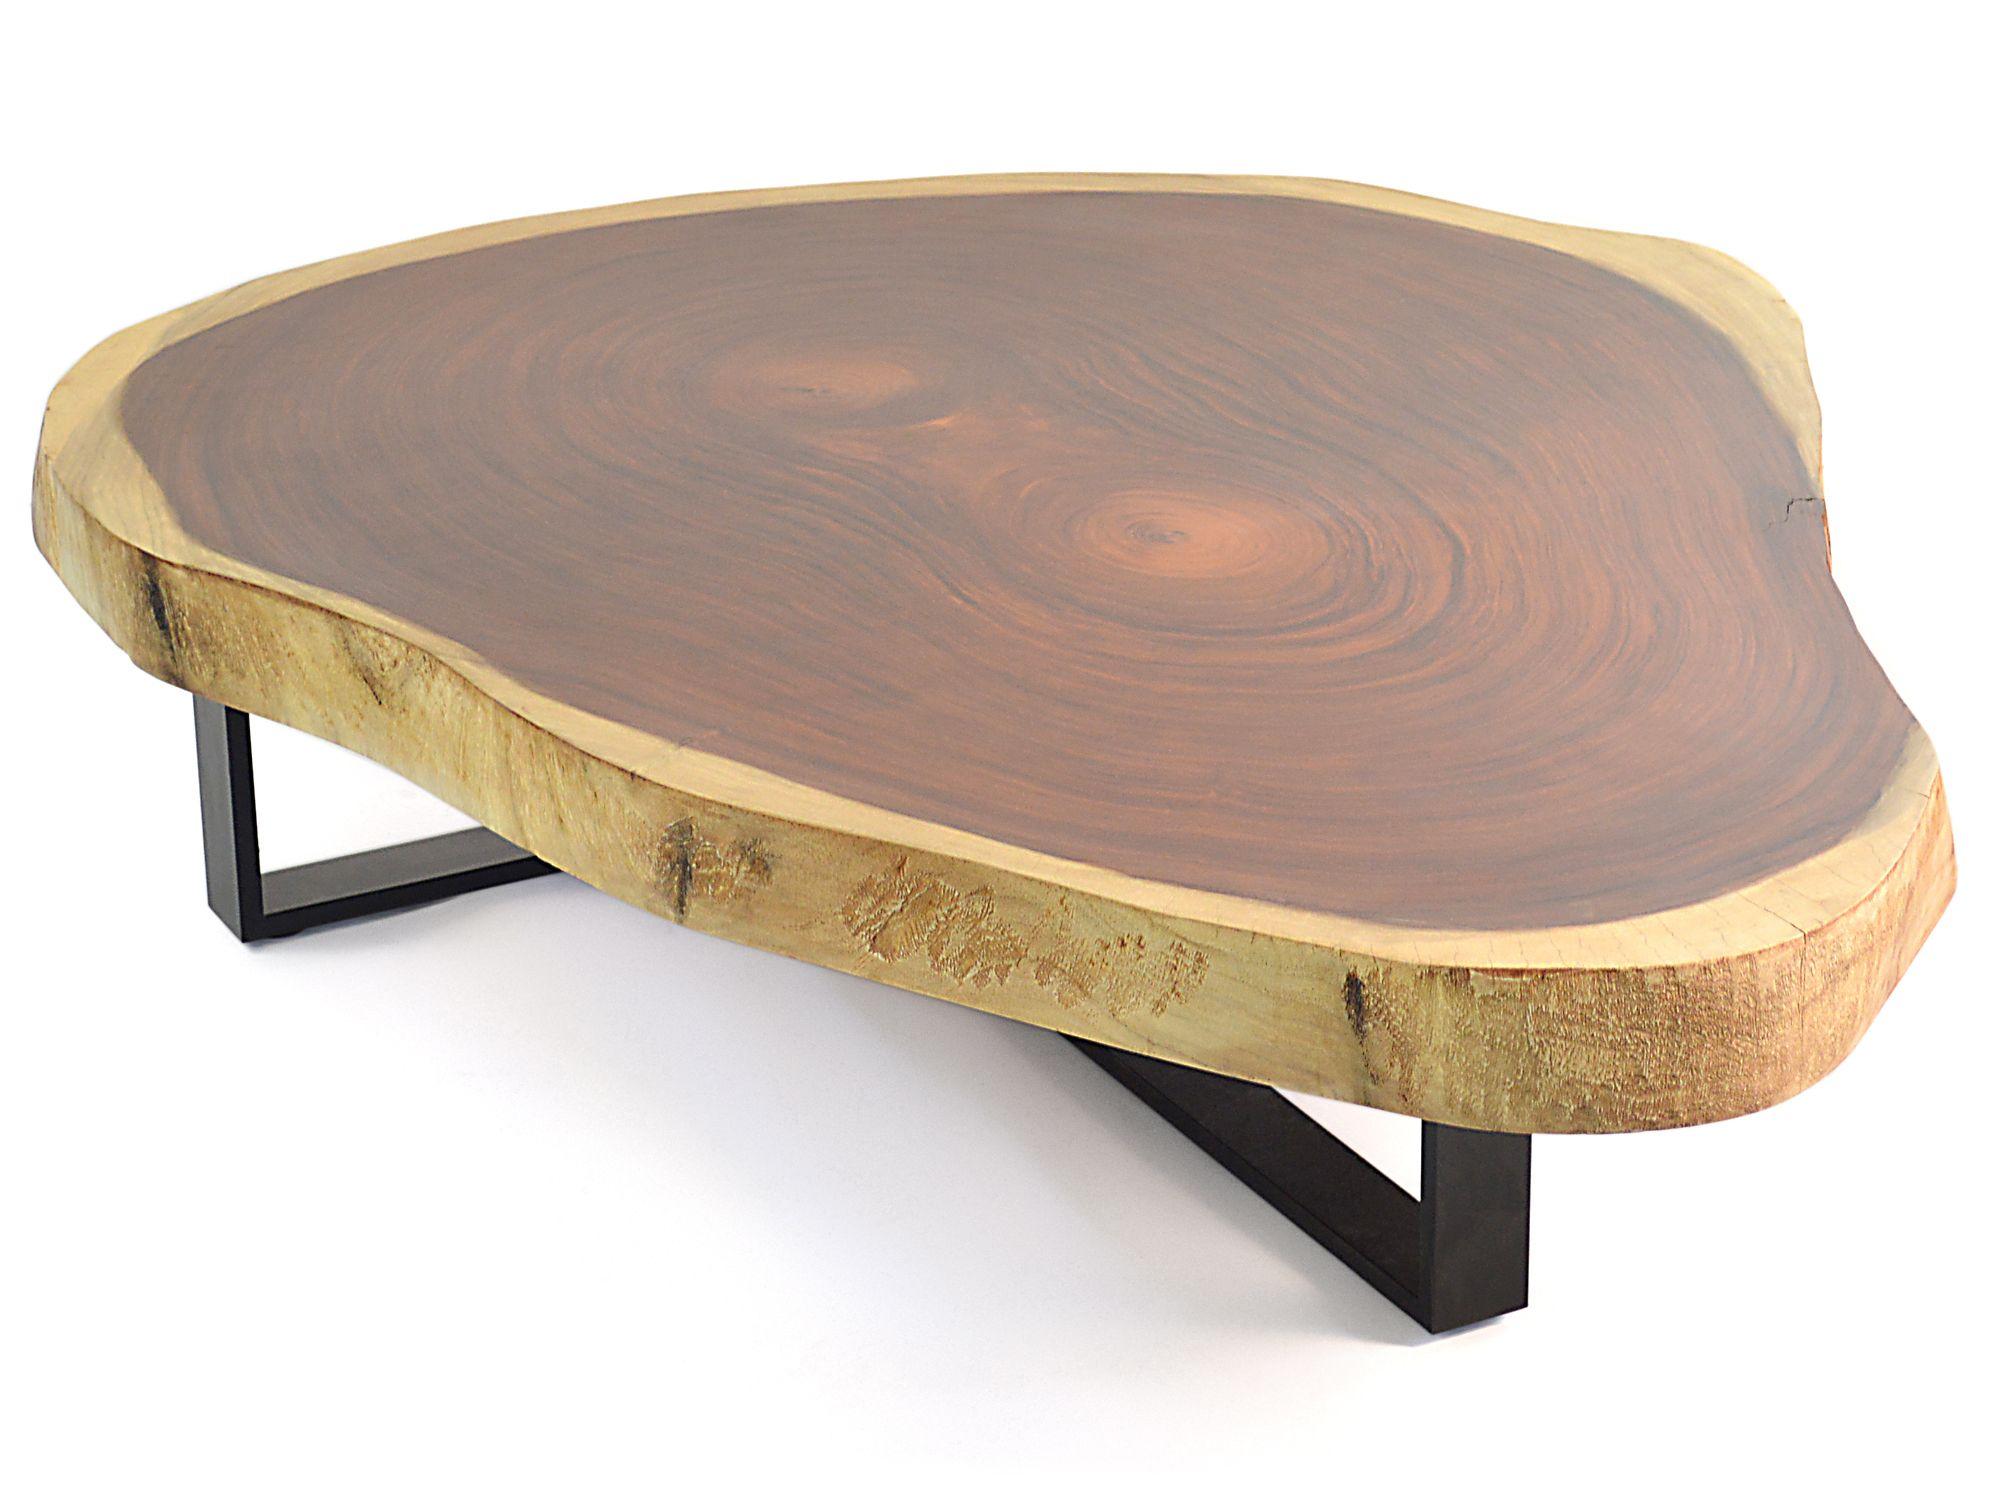 Wood Coffee Tables, Wood Table, Project Ideas, Wood Furniture, Minimalism,